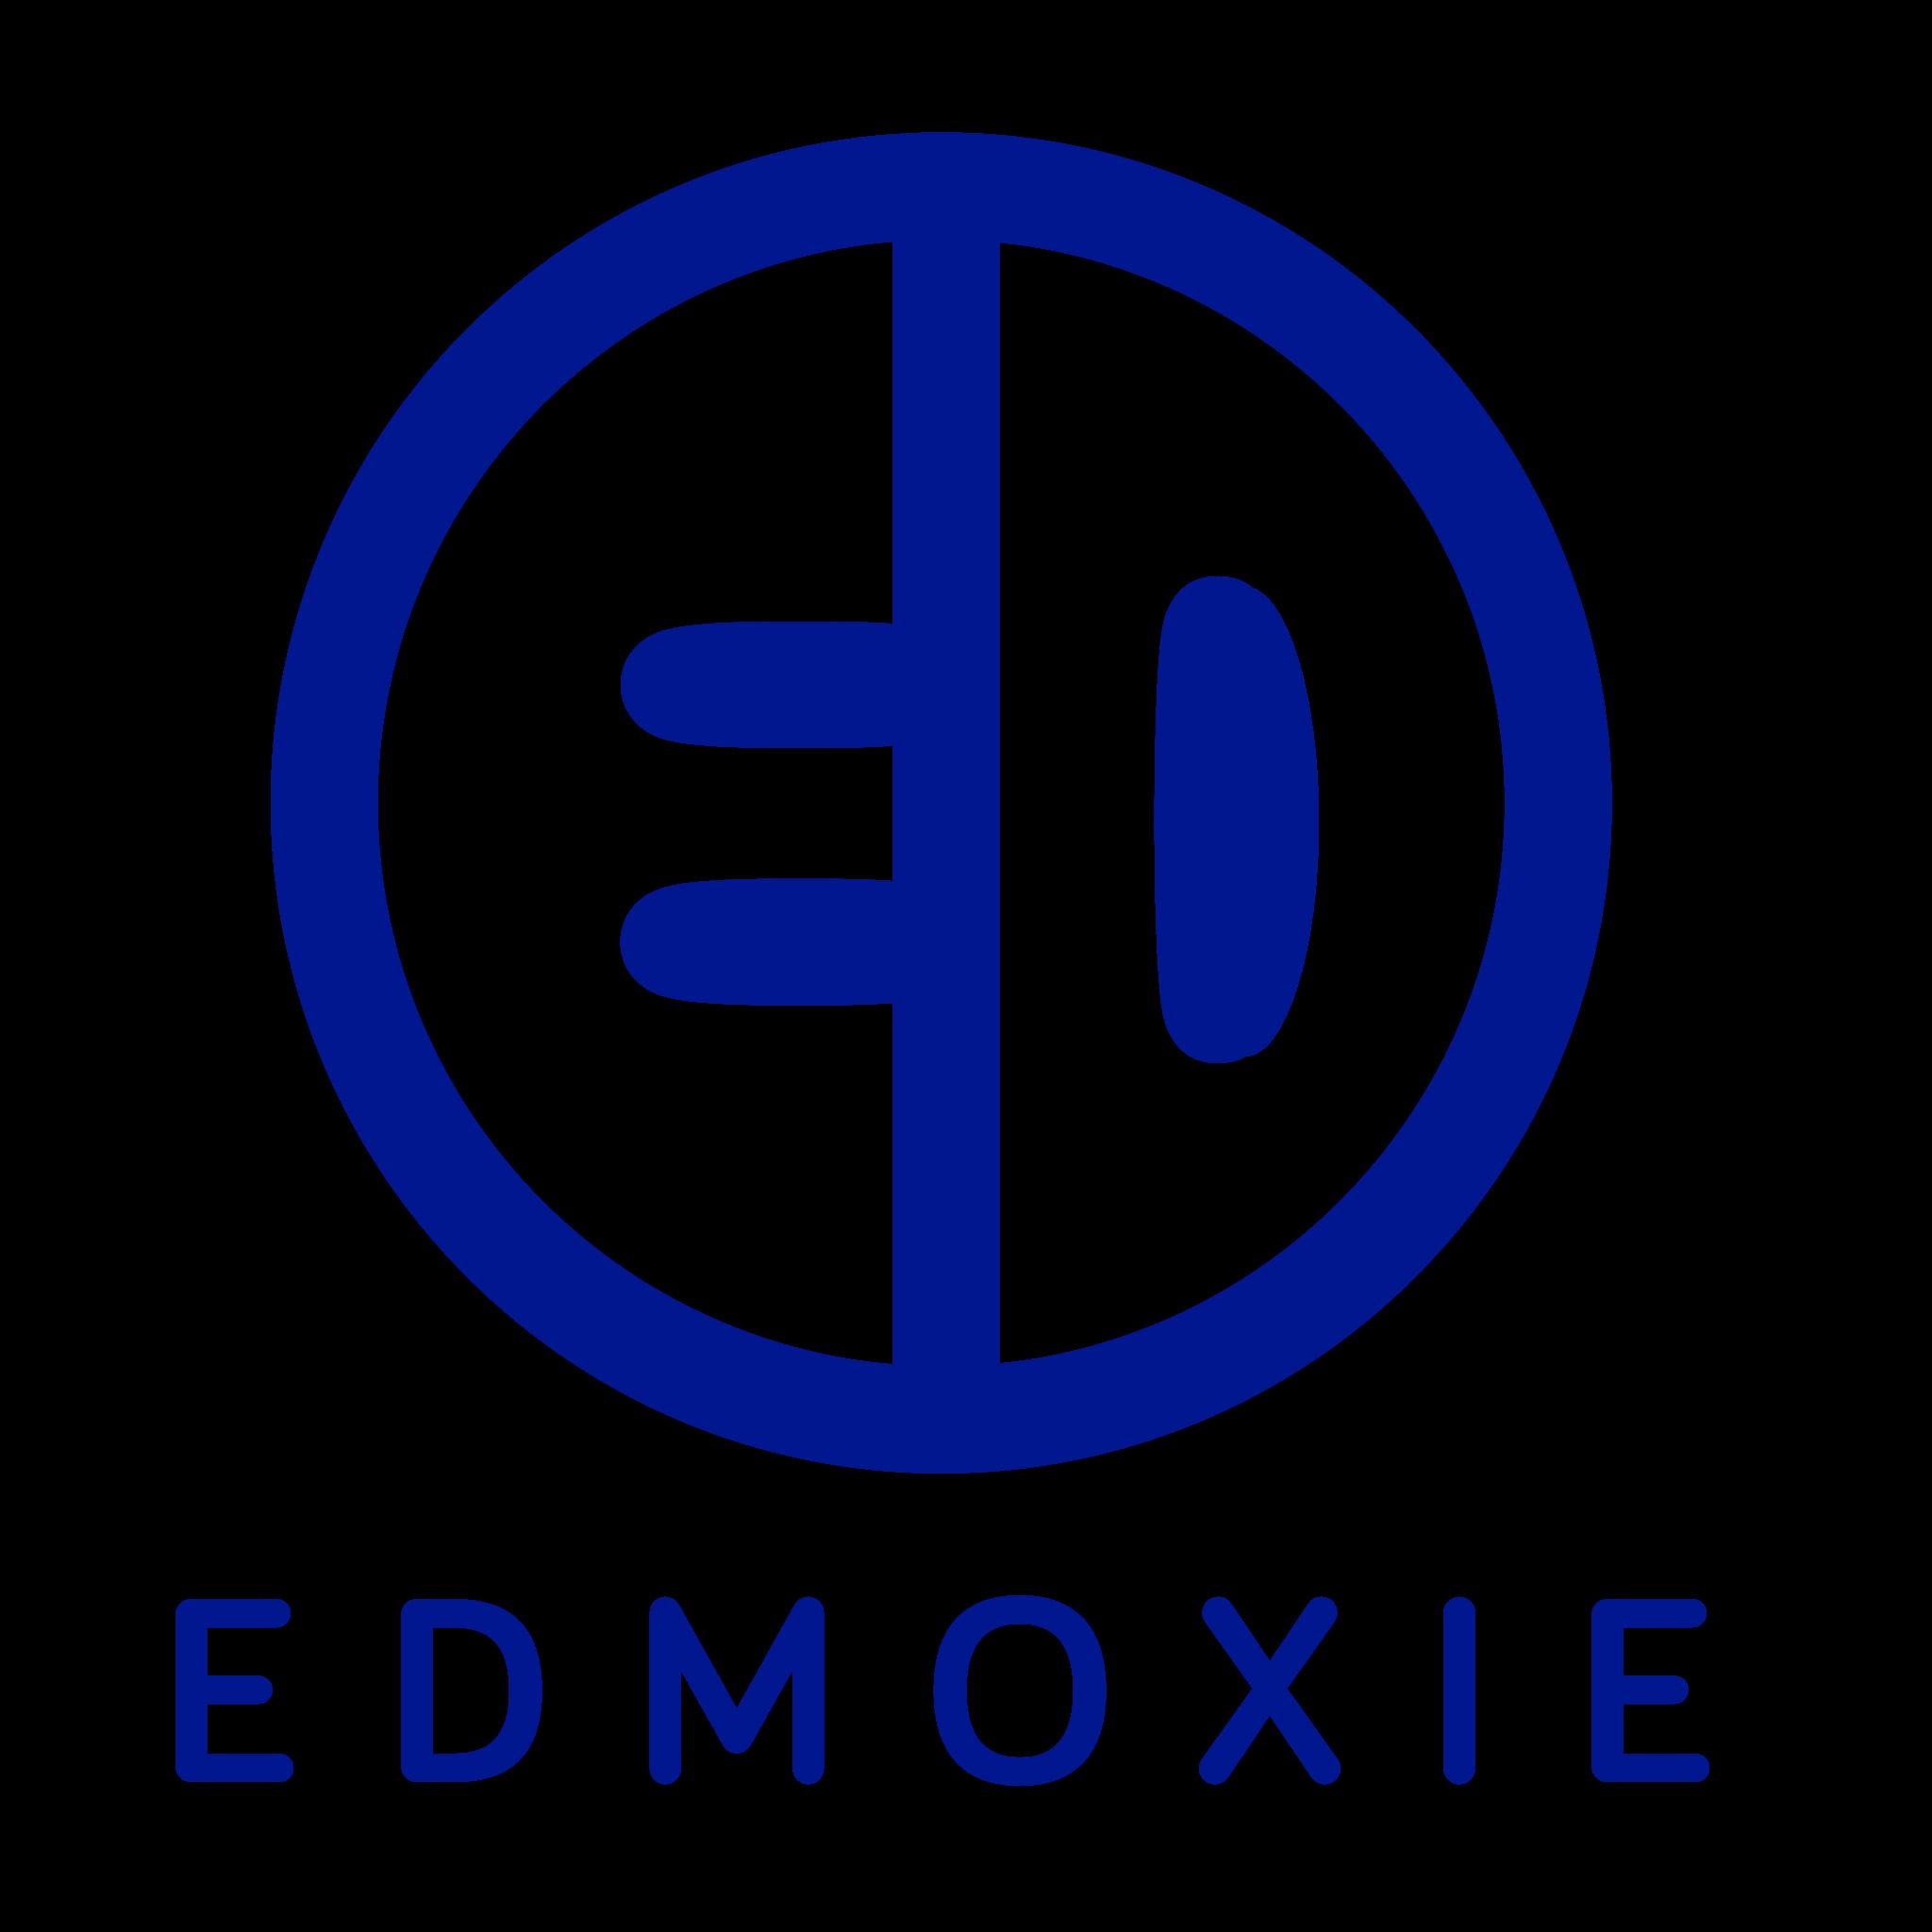 Edmoxie logo